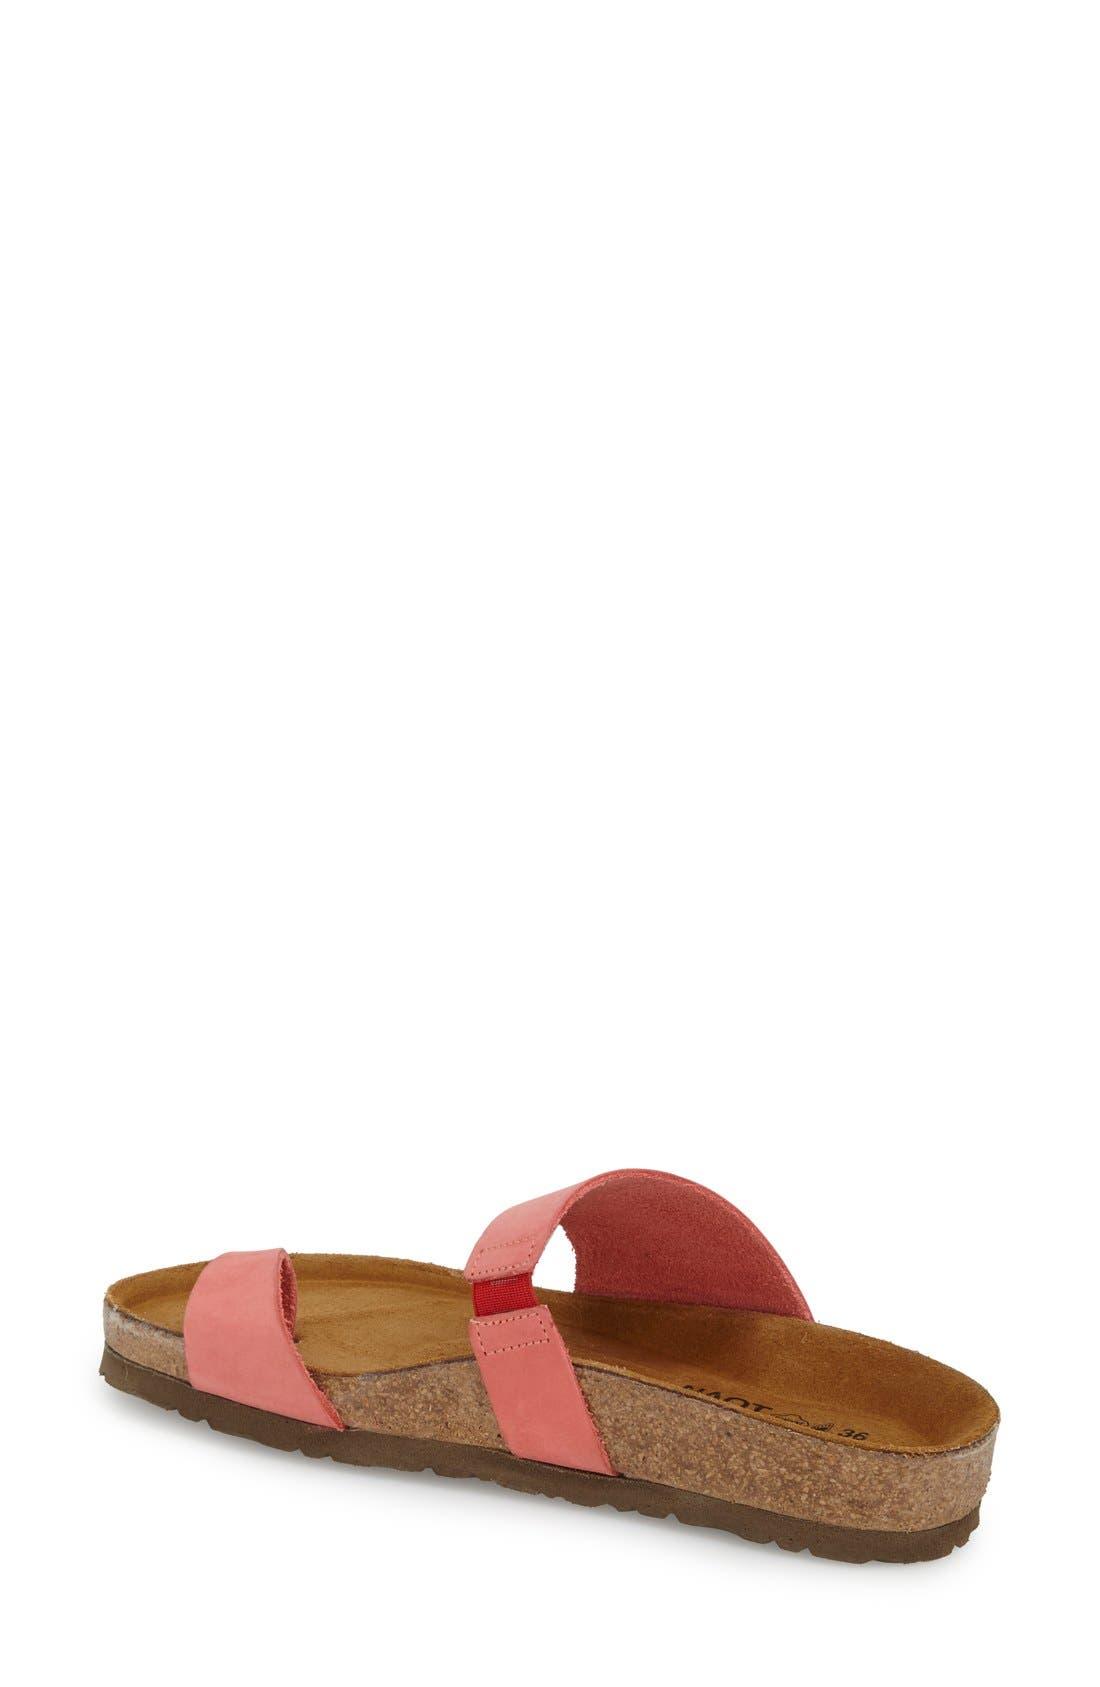 'Santa Fe' Sandal,                             Alternate thumbnail 9, color,